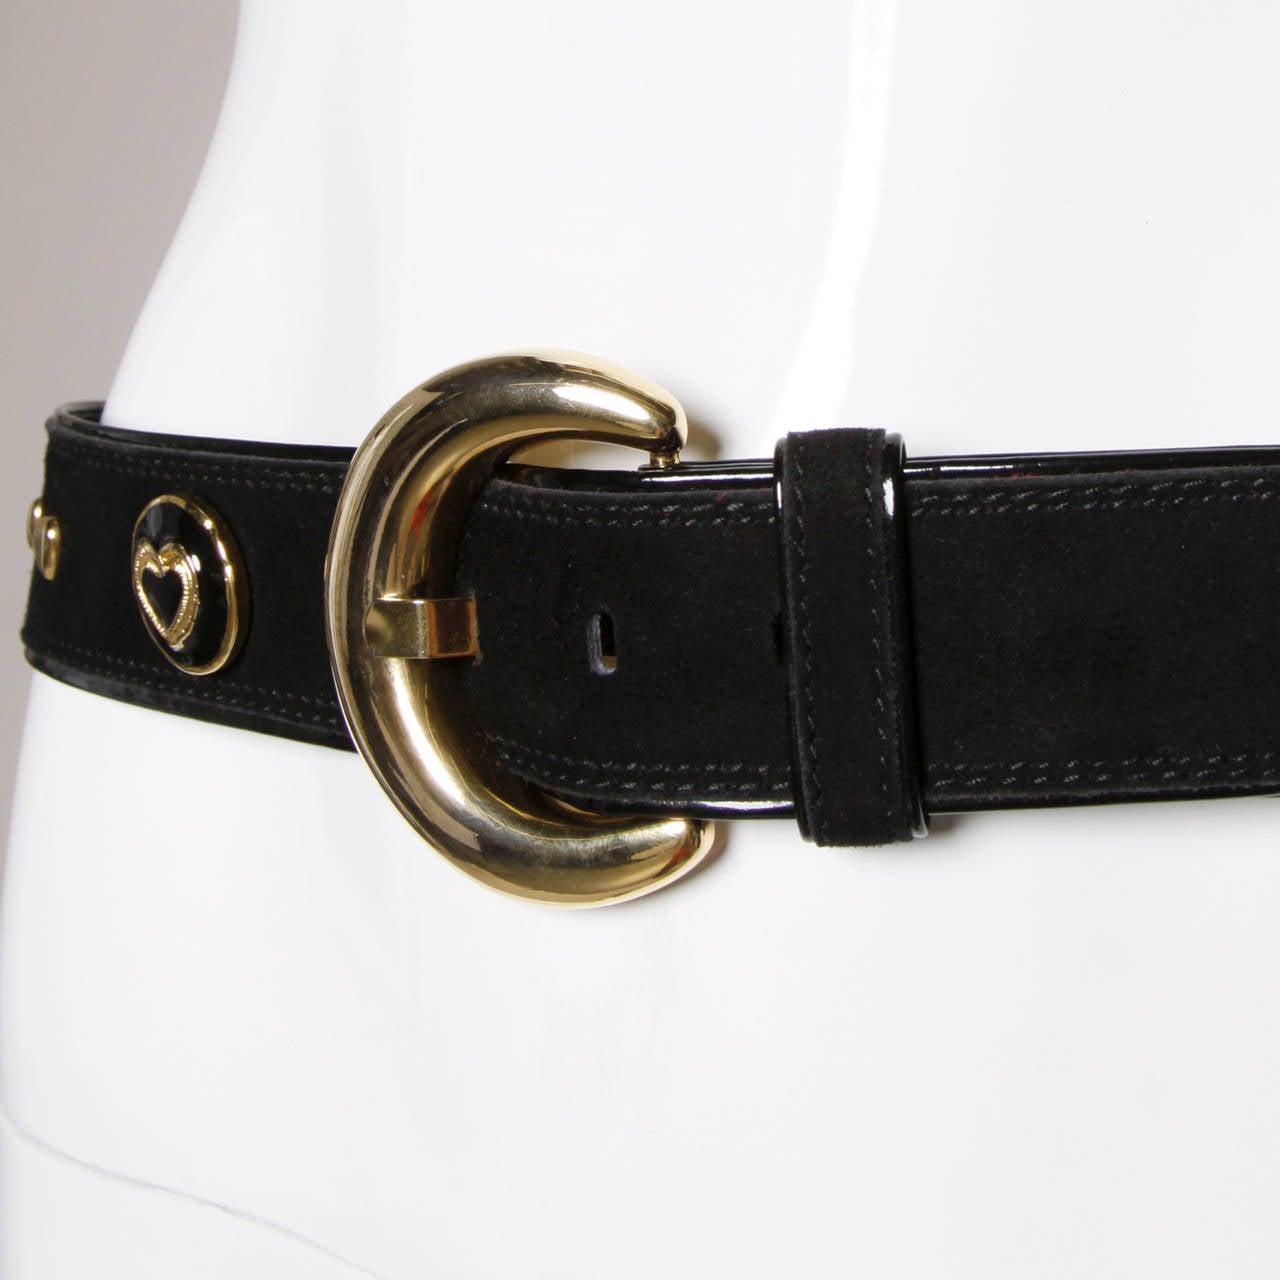 Escada Vintage Black Leather Heart Belt 4